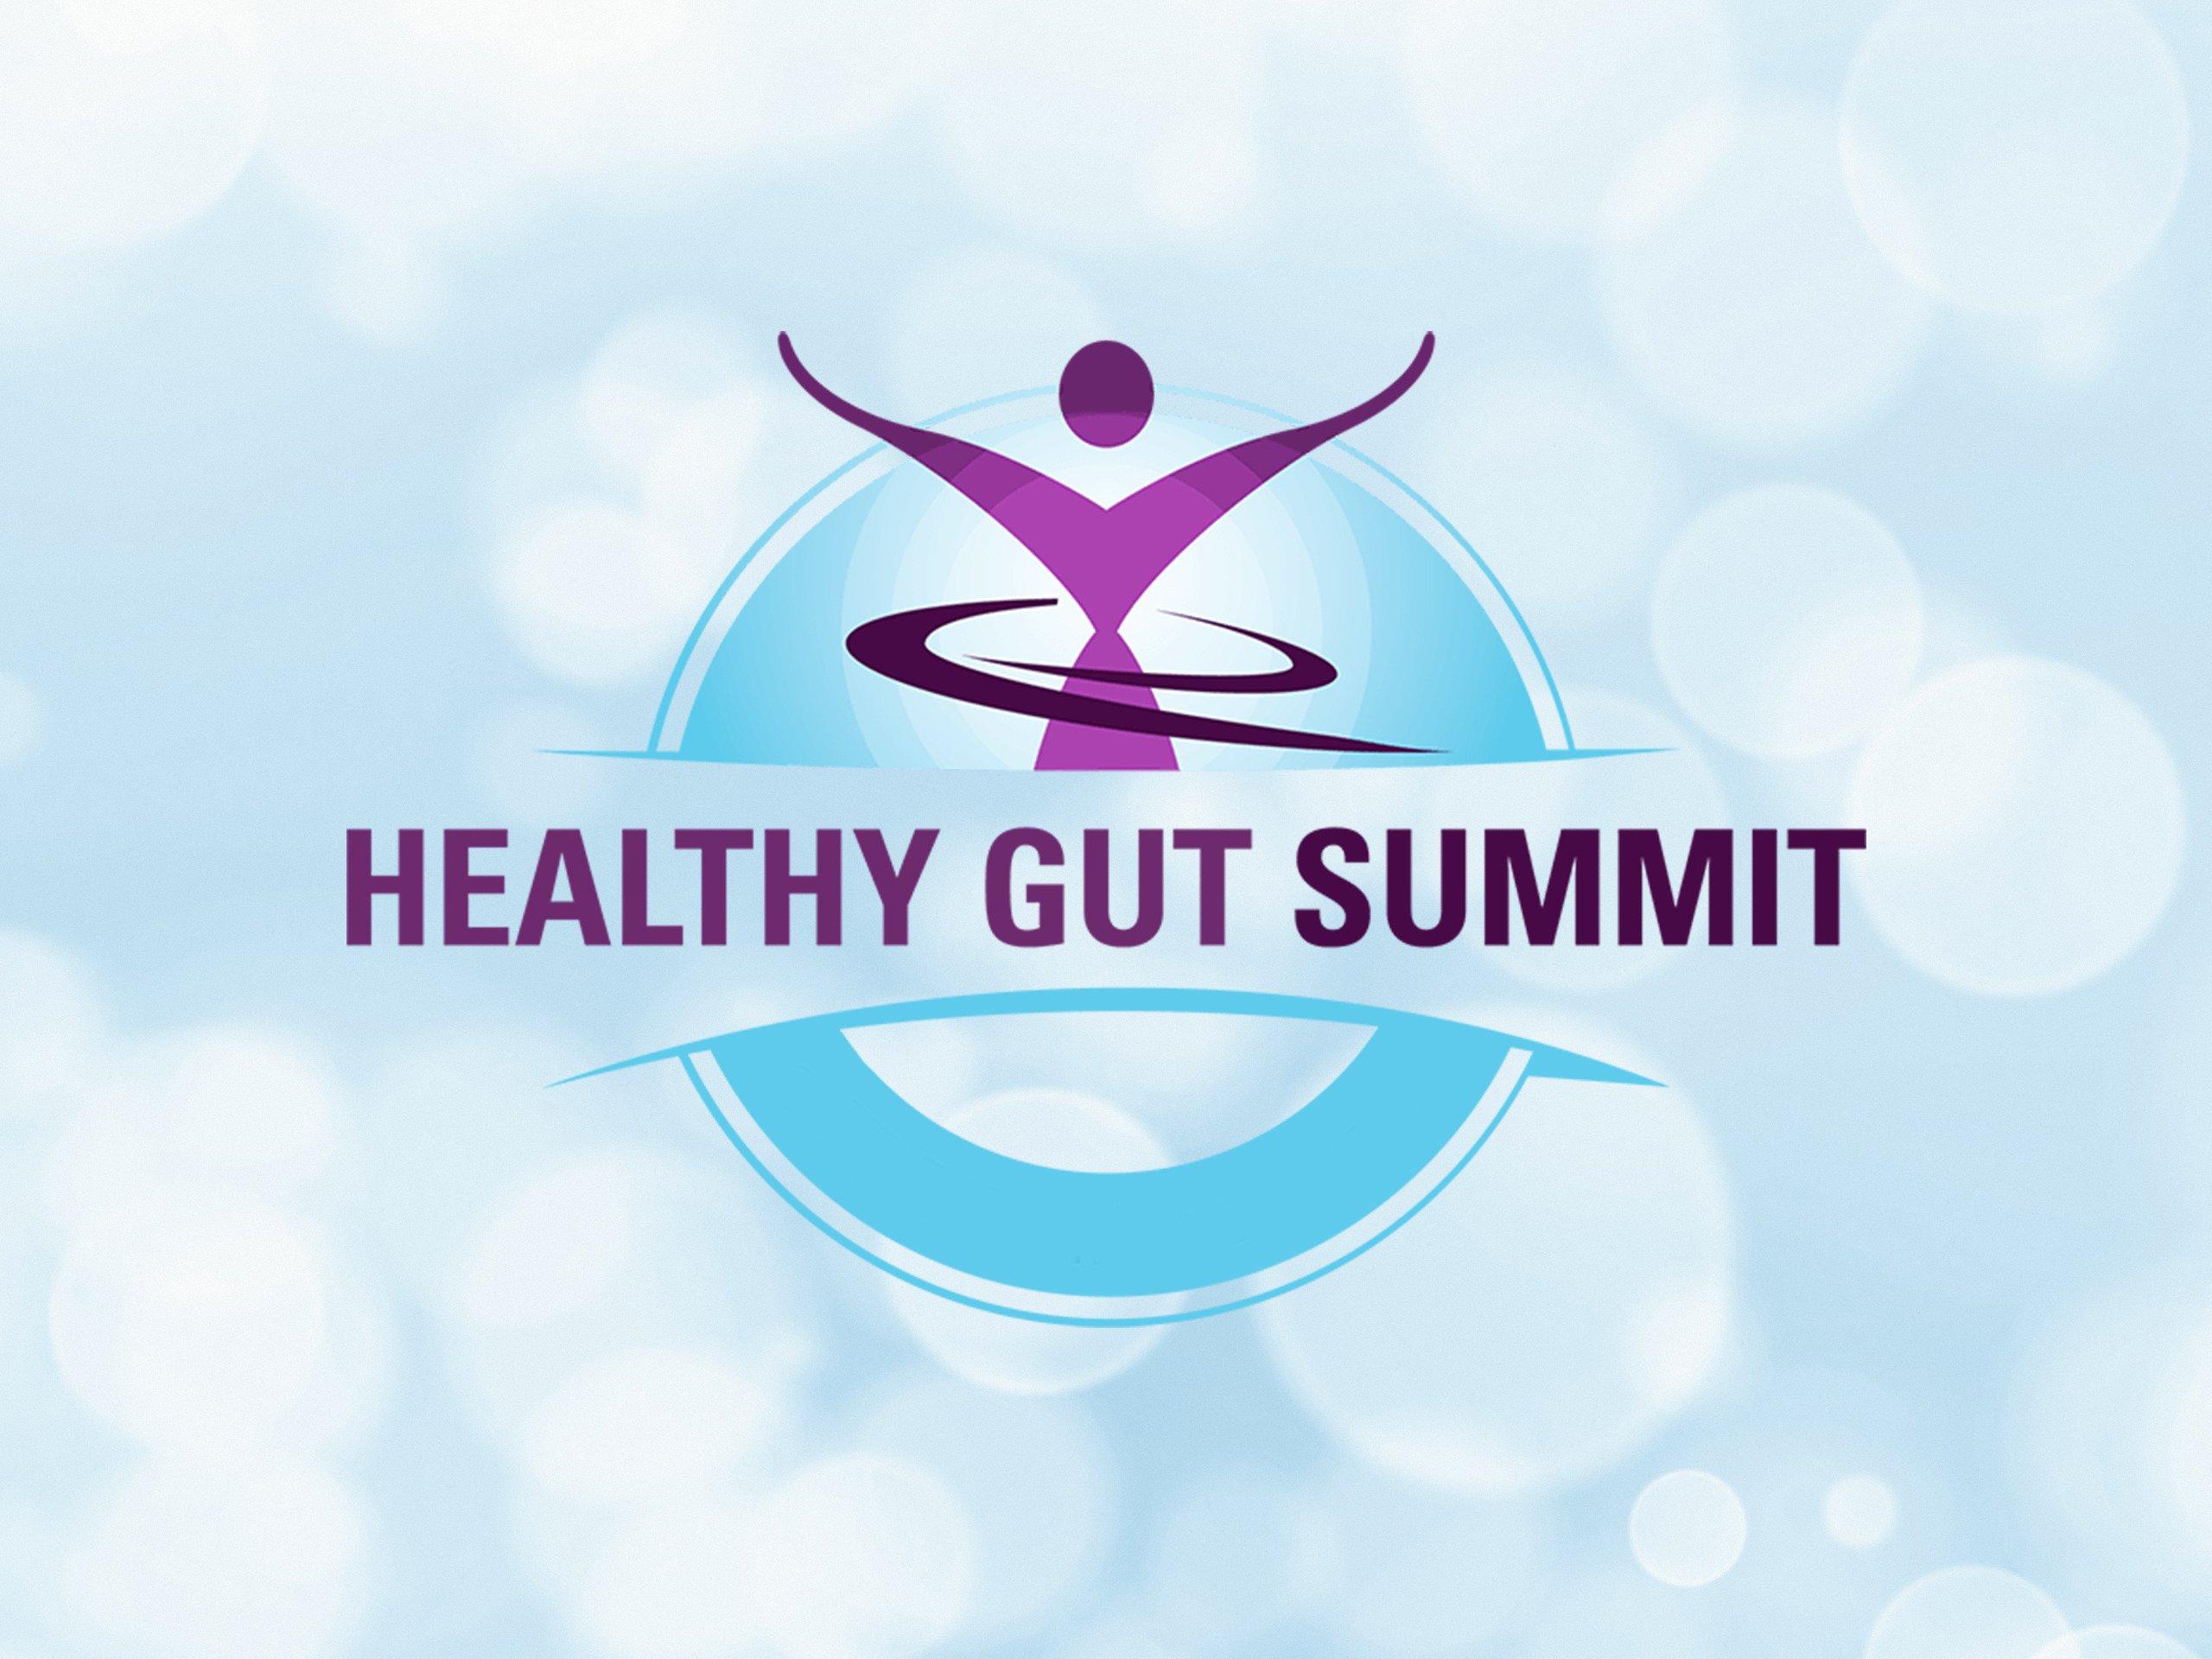 The Healthy Gut Summit